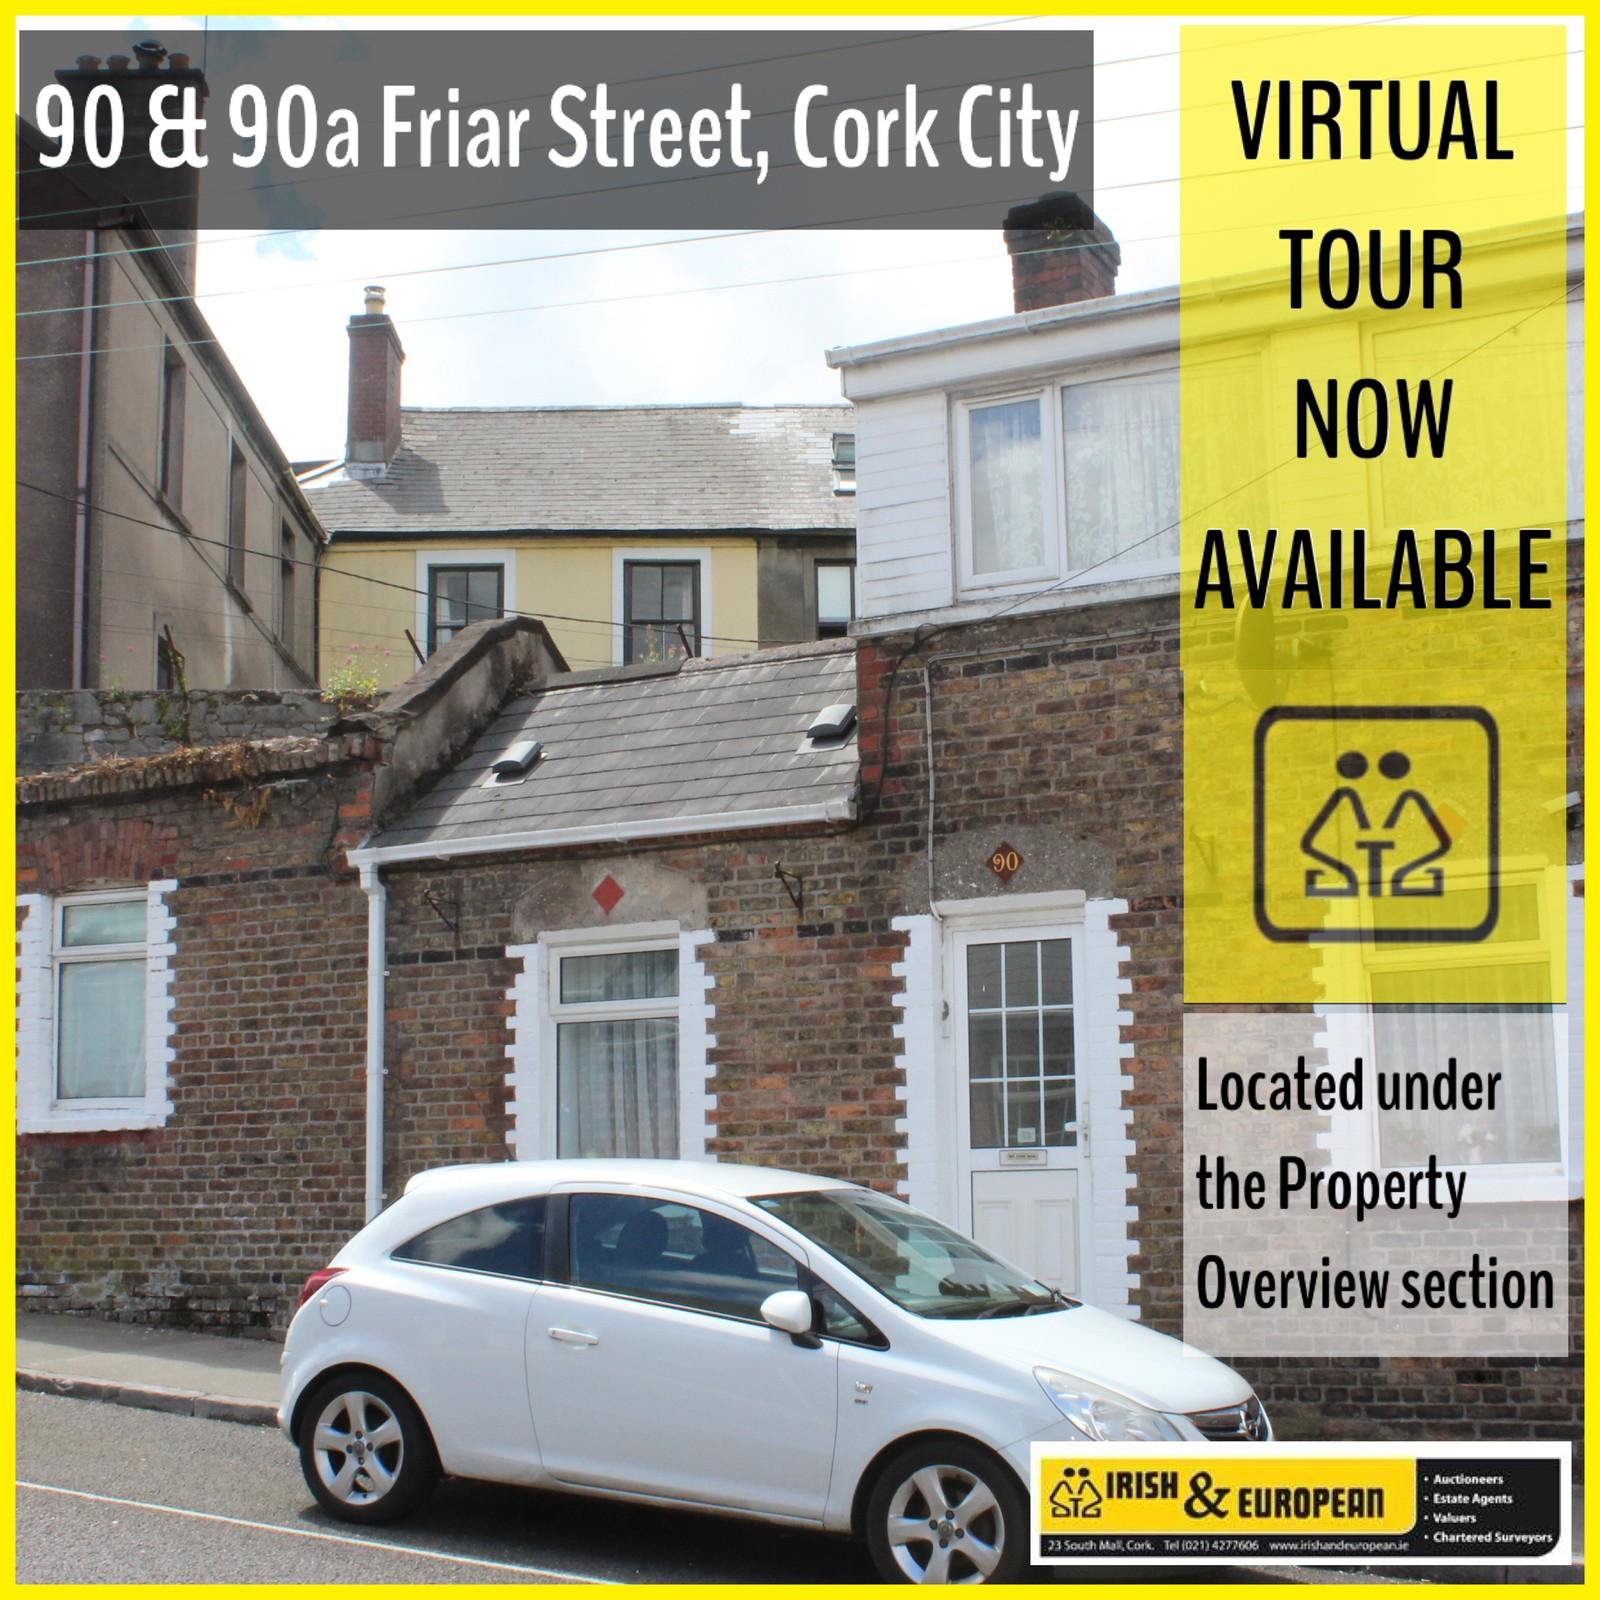 90 Friar Street, Cork City, Co. Cork